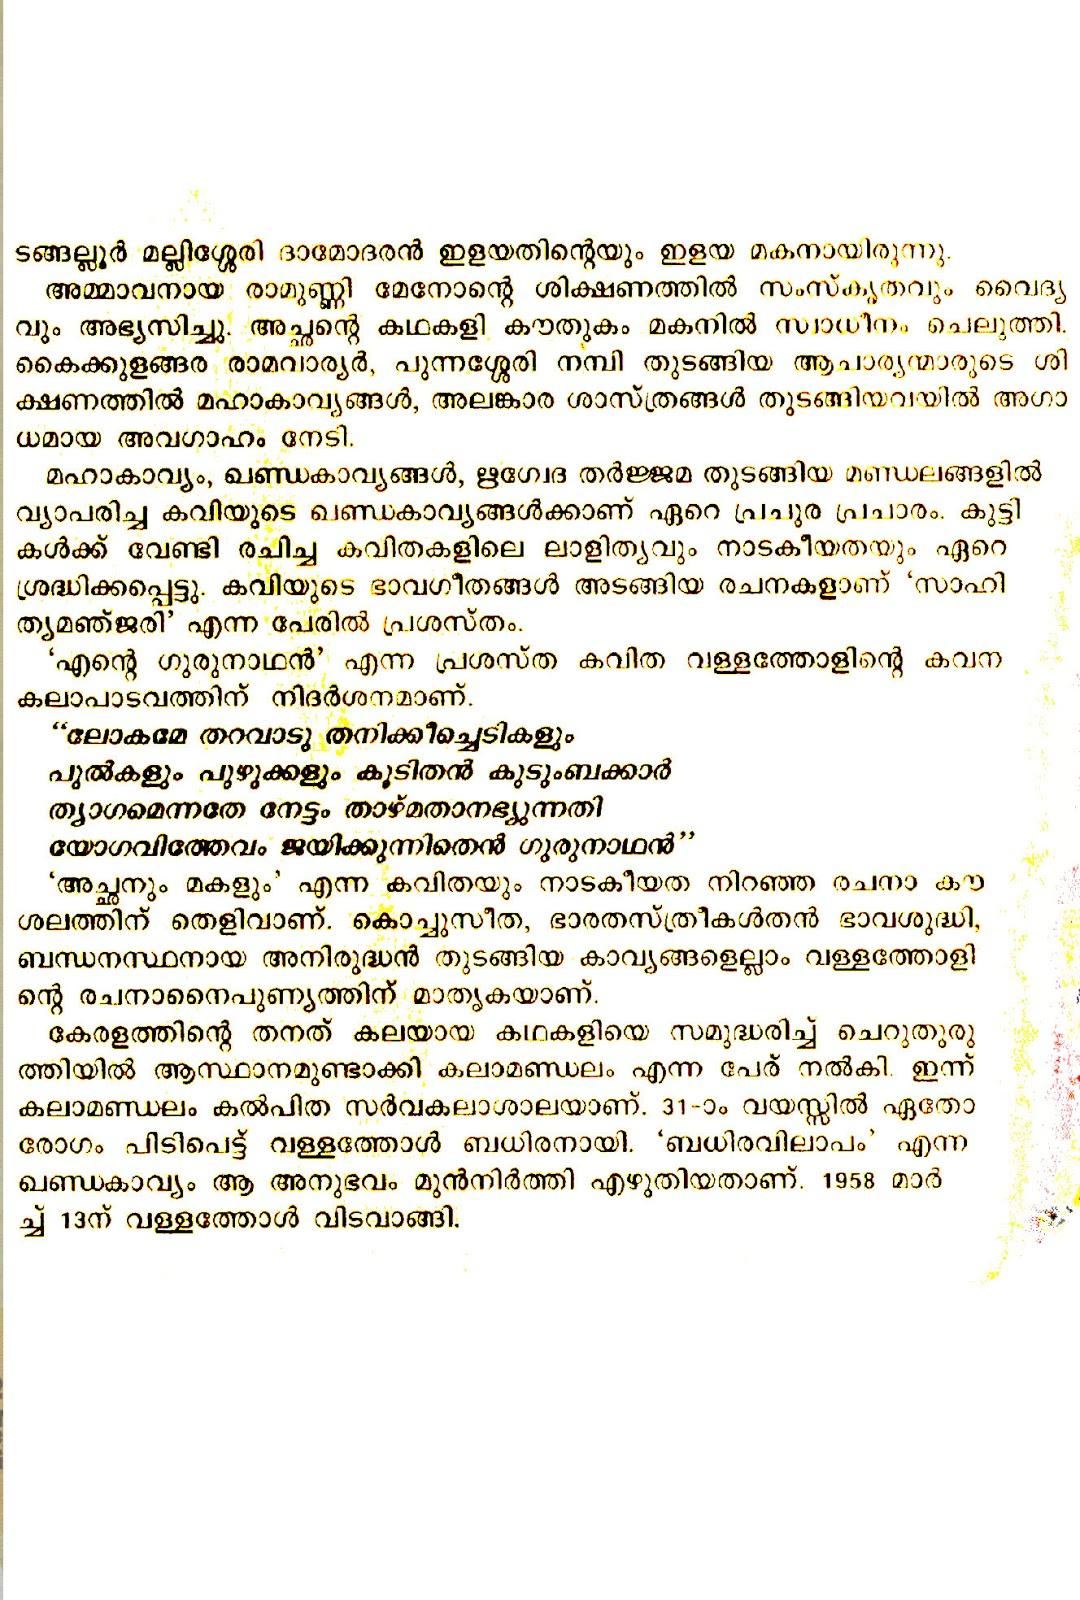 Vallathol Narayana Menon, 1878